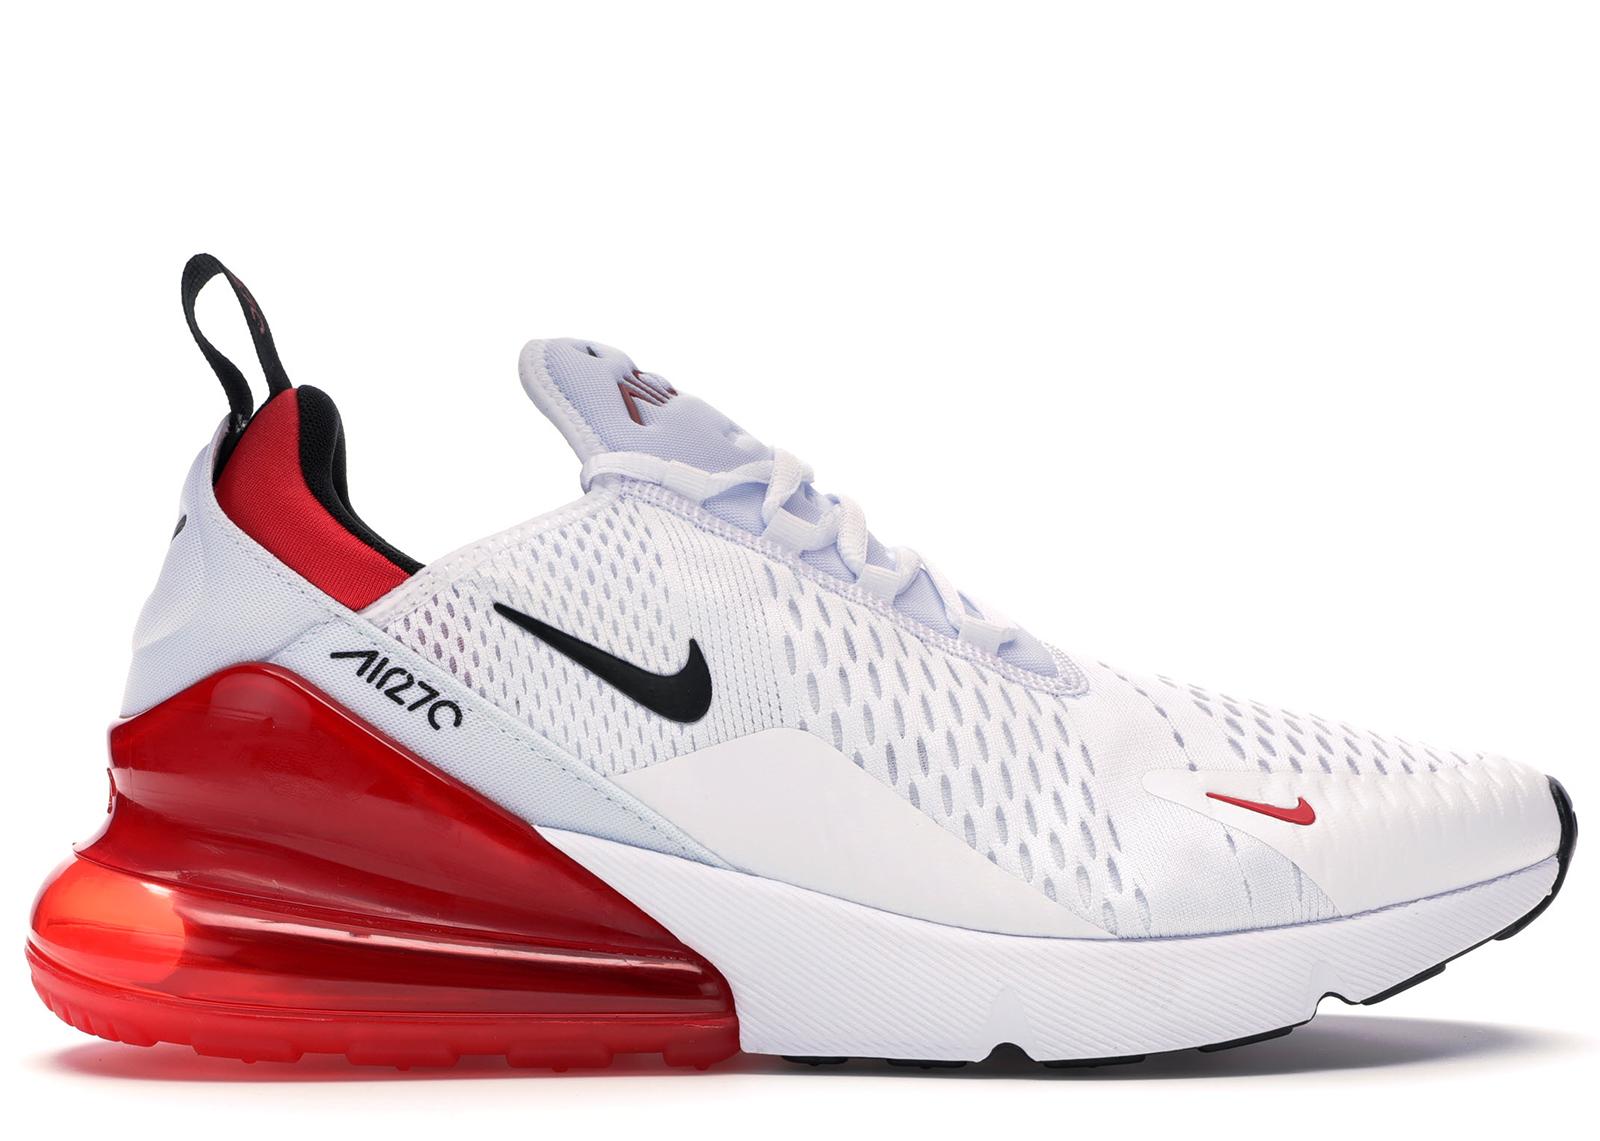 Nike Air Max 270 White Black University Red